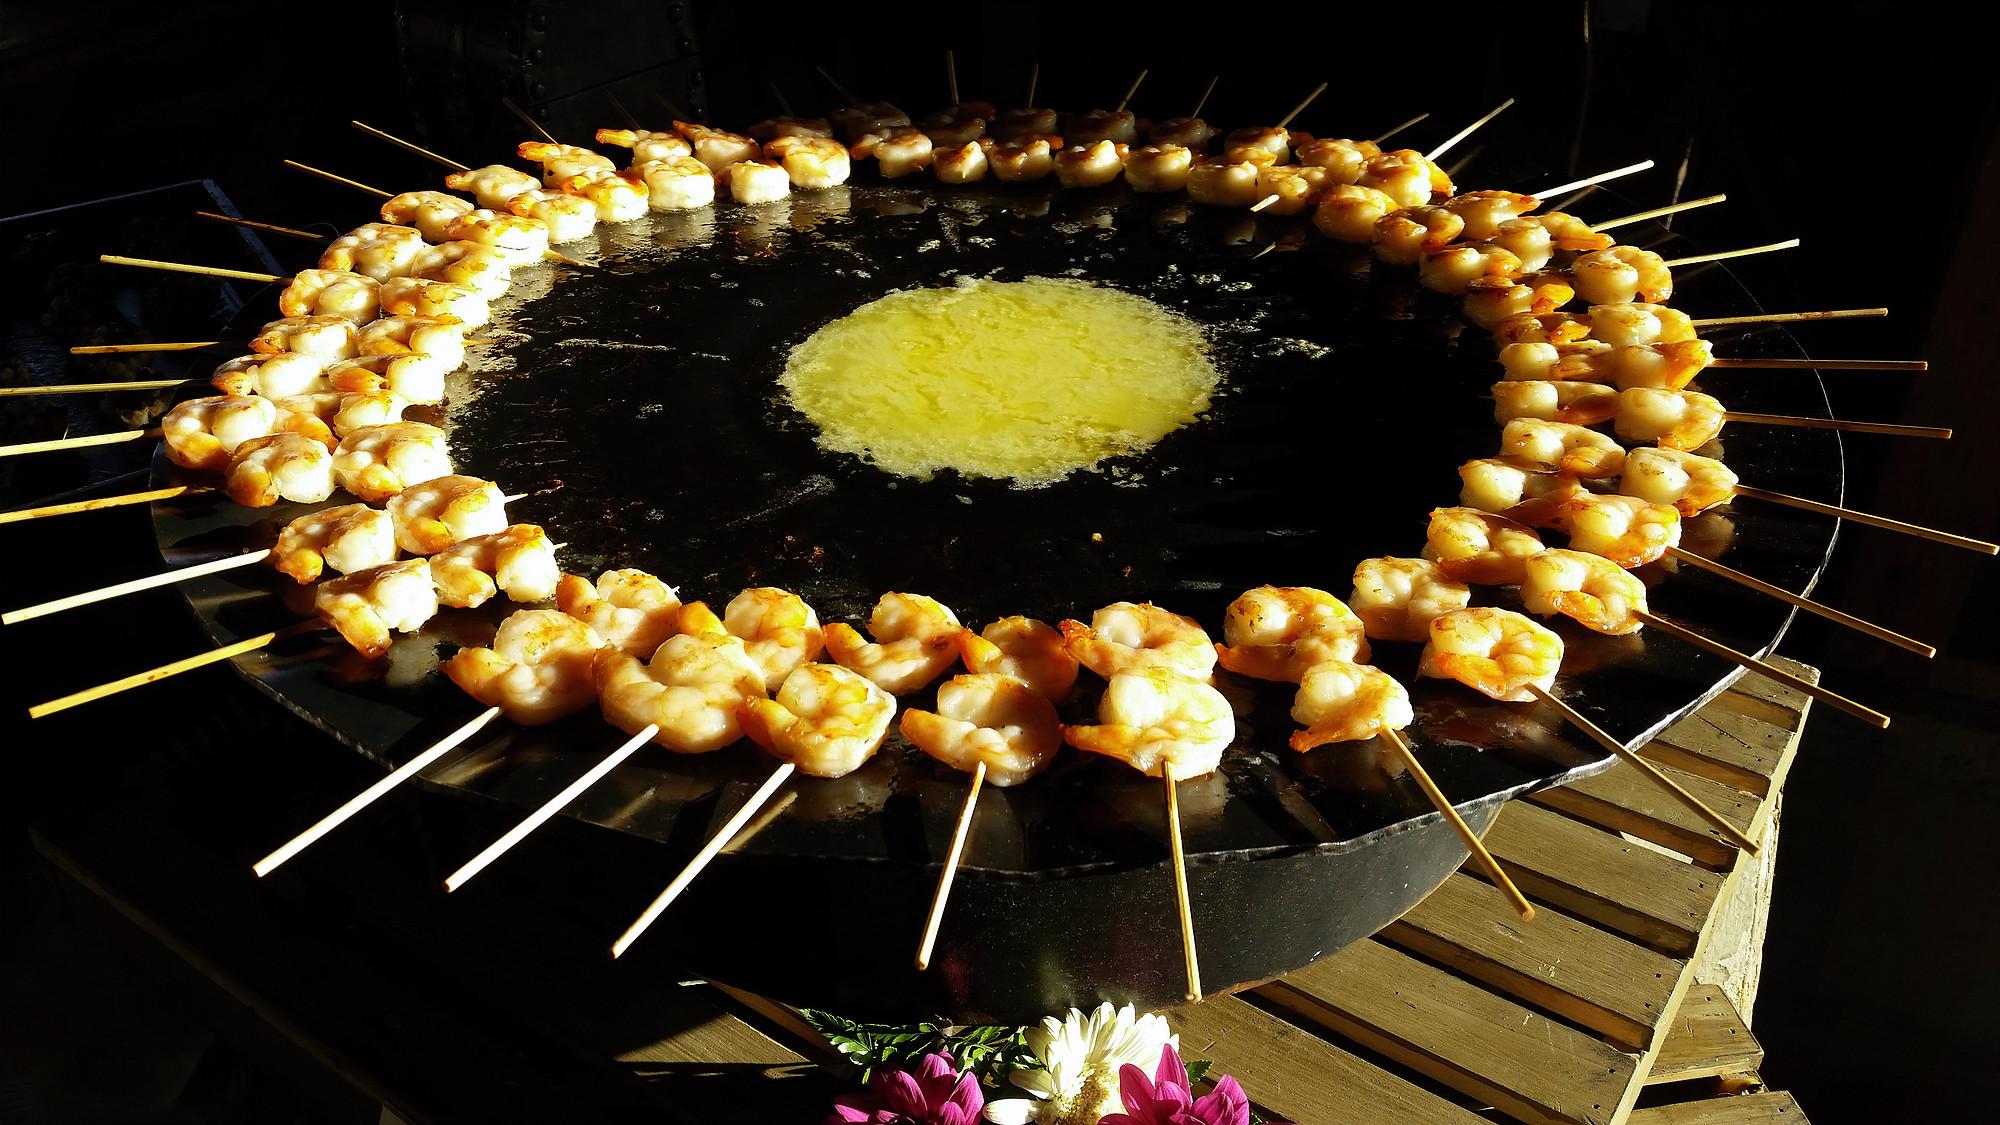 Grilled Shrimp Skewers with Lemon Butter Sauce